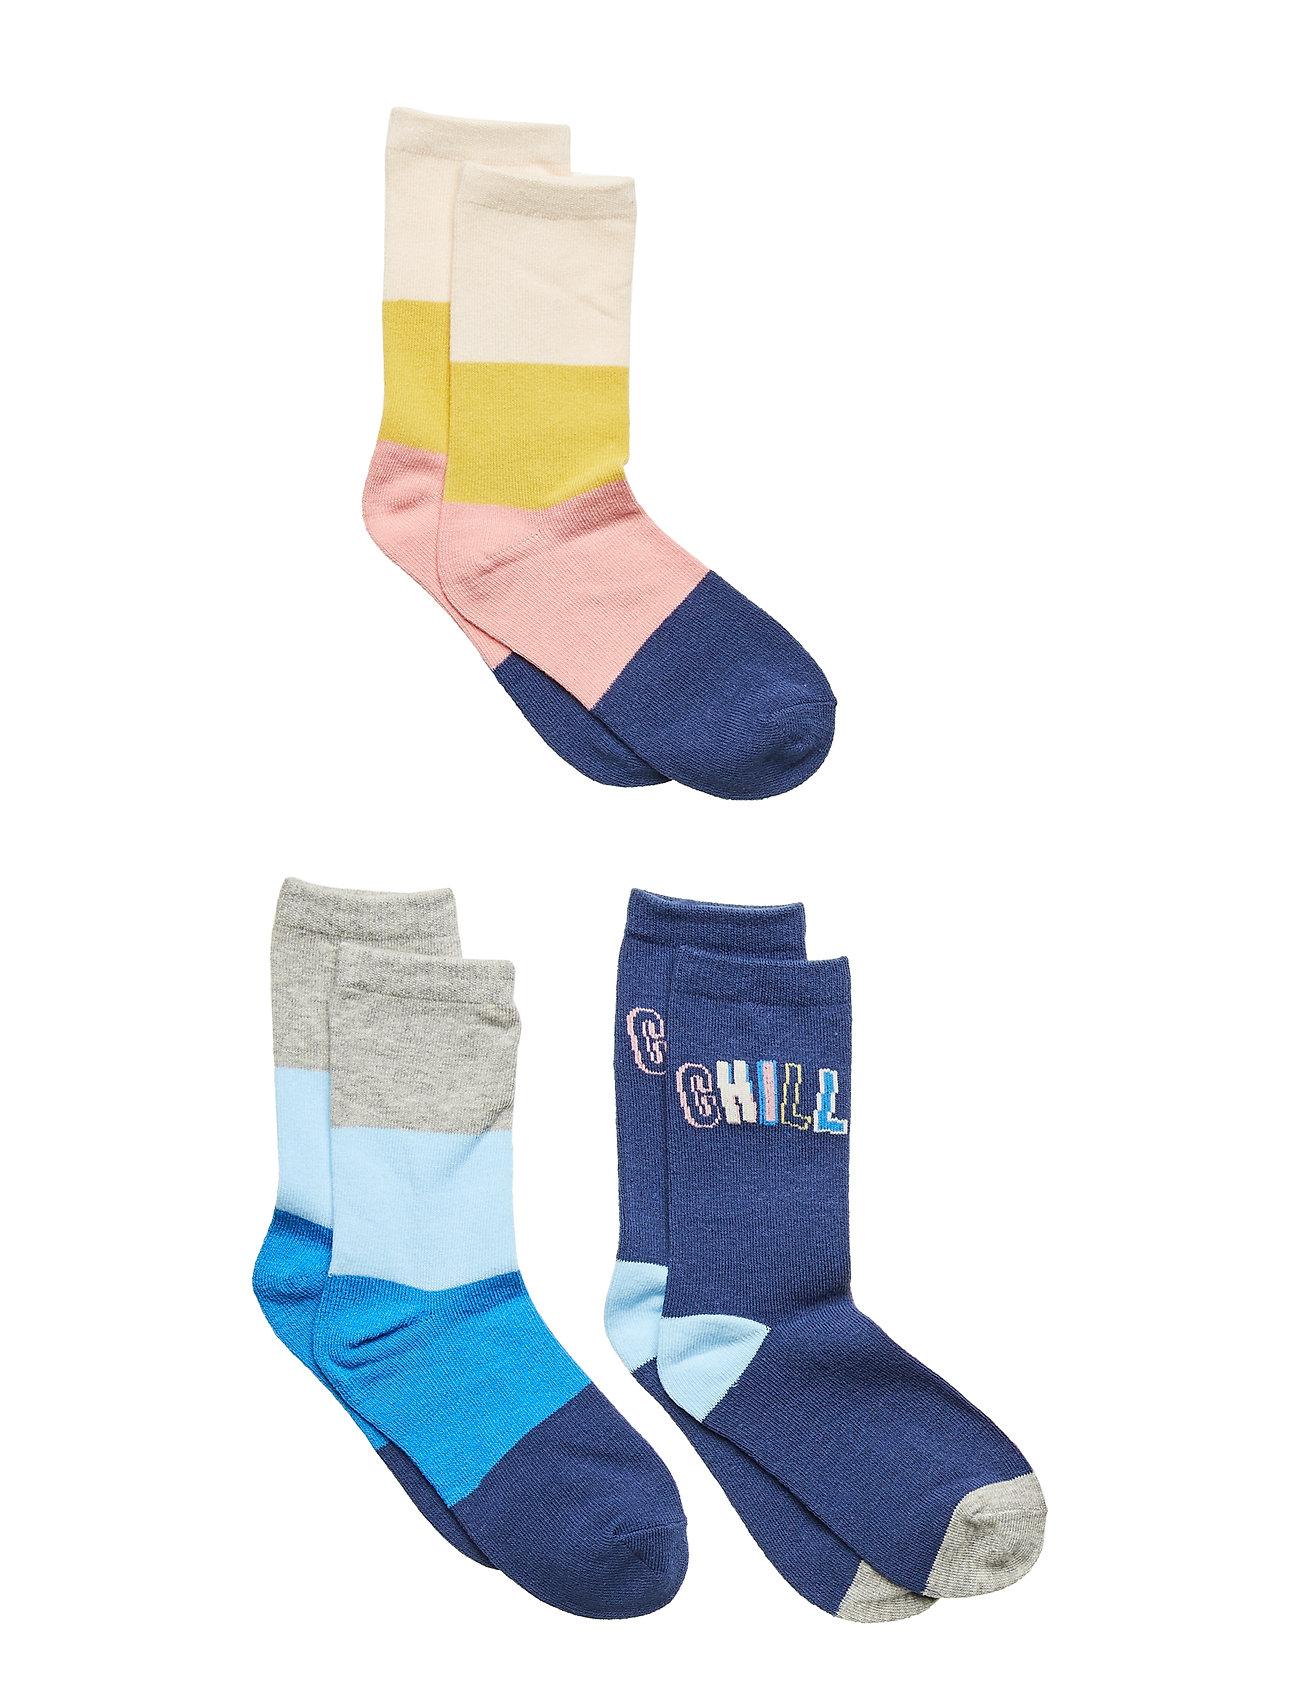 GAP Kids Chill Crew Socks (3-Pack) - MULTI